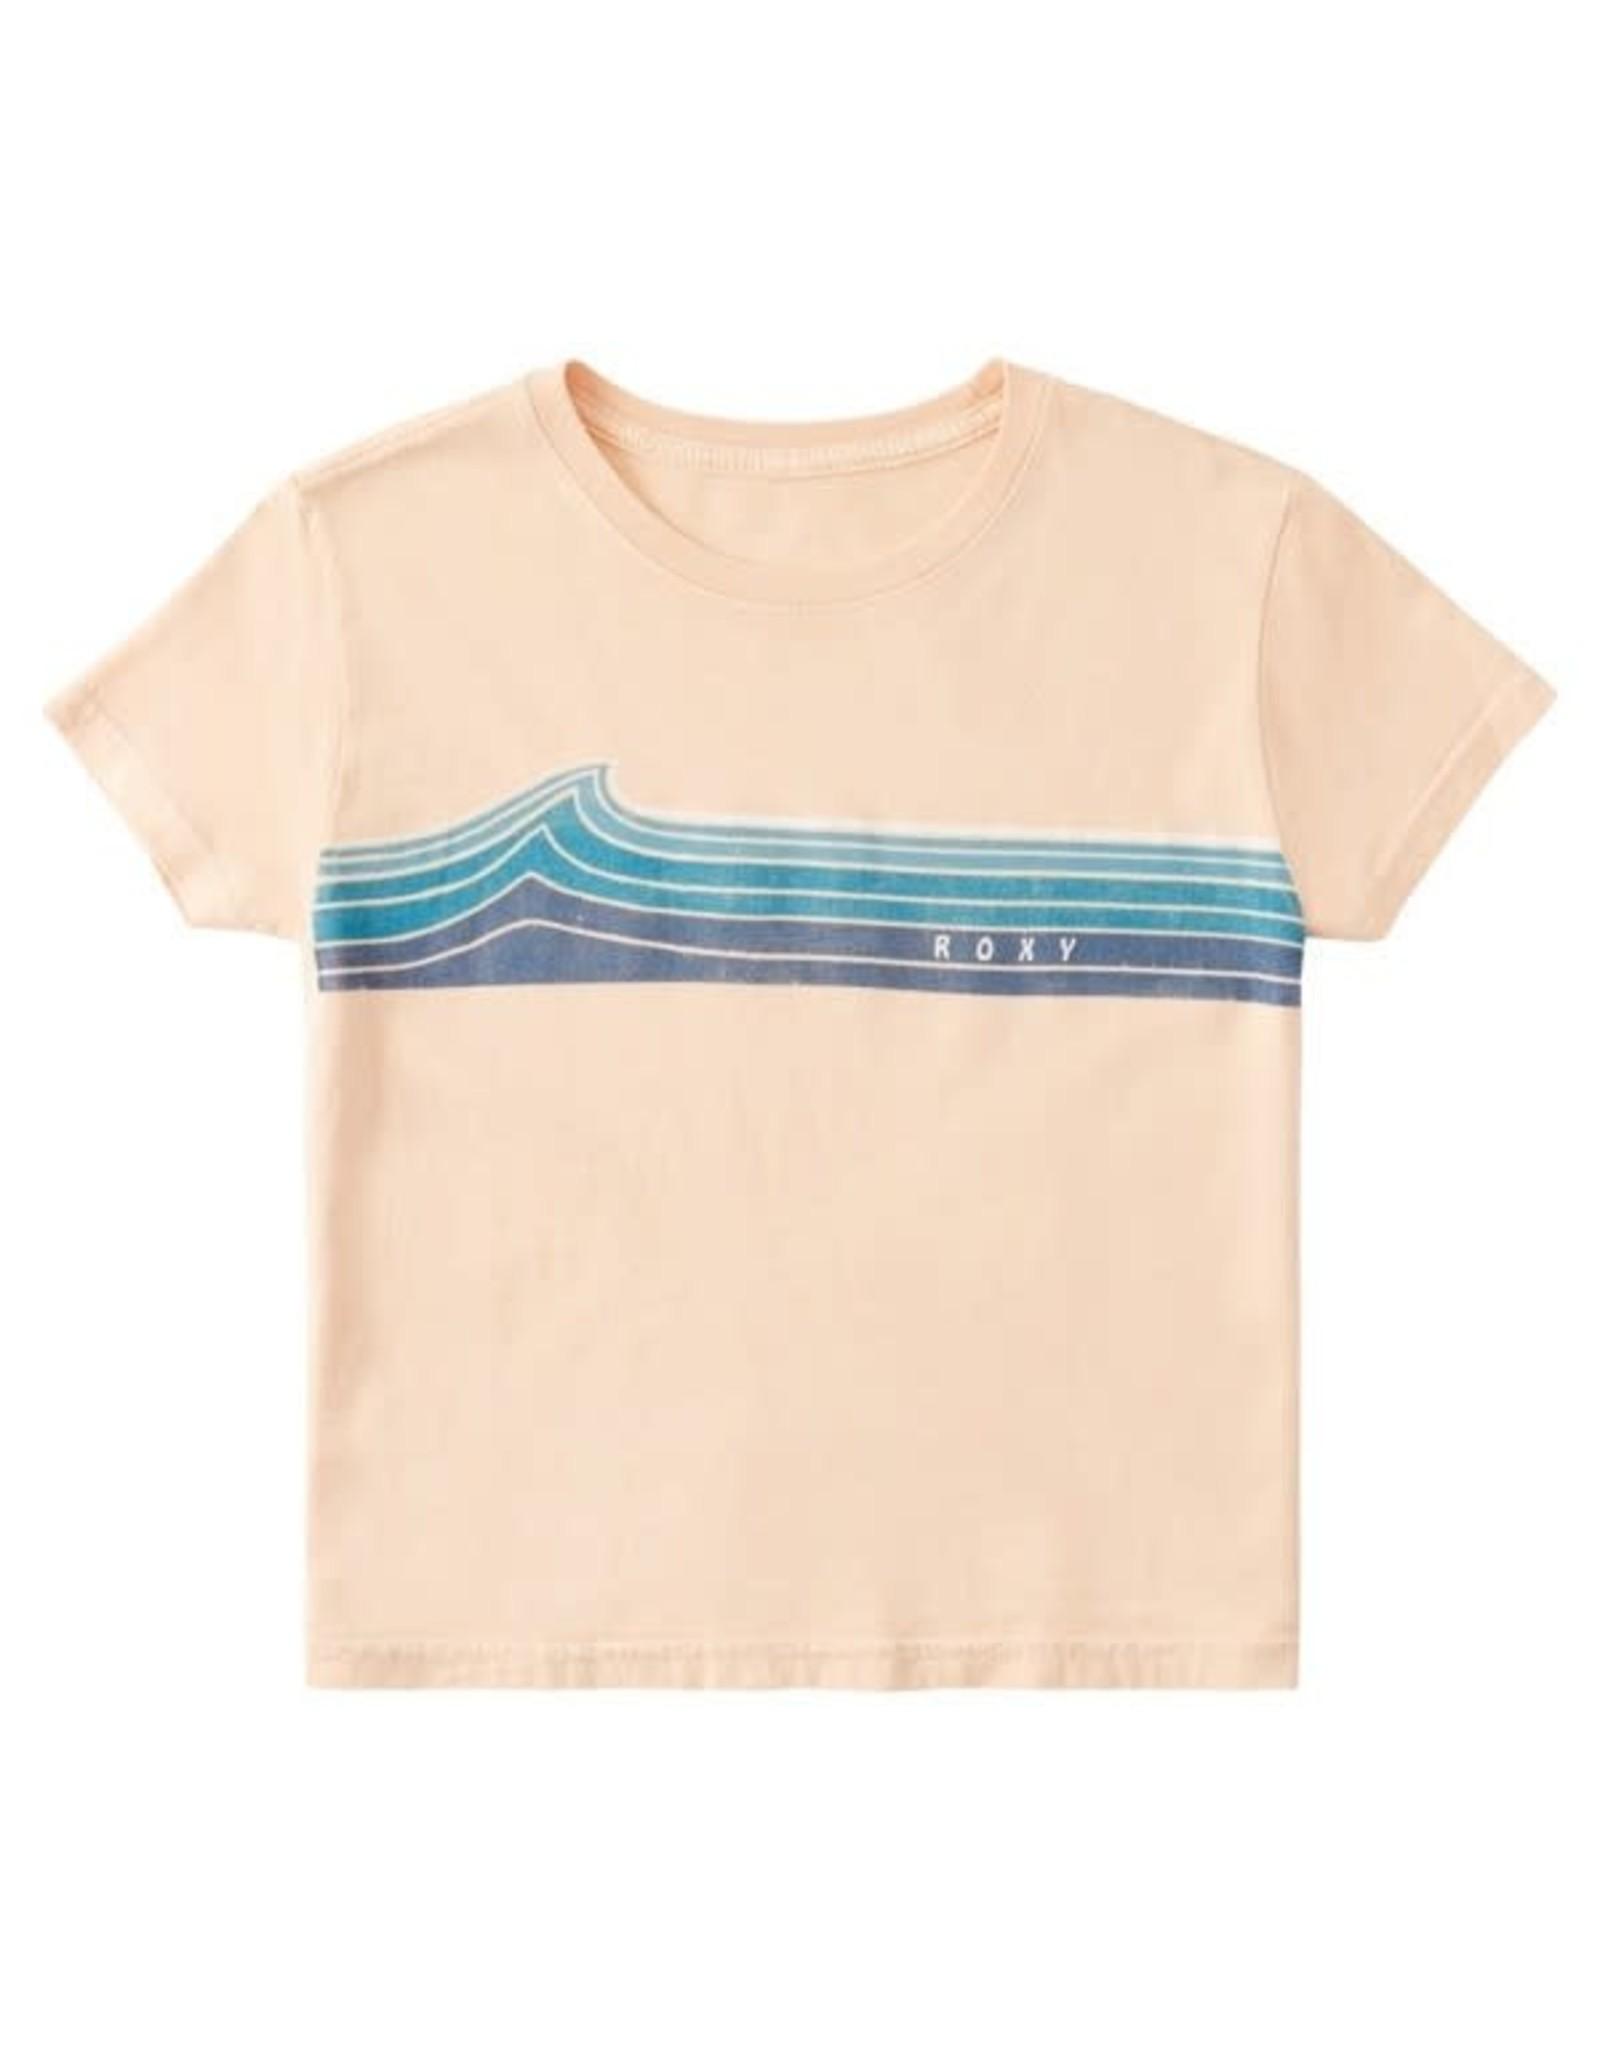 Roxy Roxy Girl Wavey Stripe SS Tee ARGZT03577